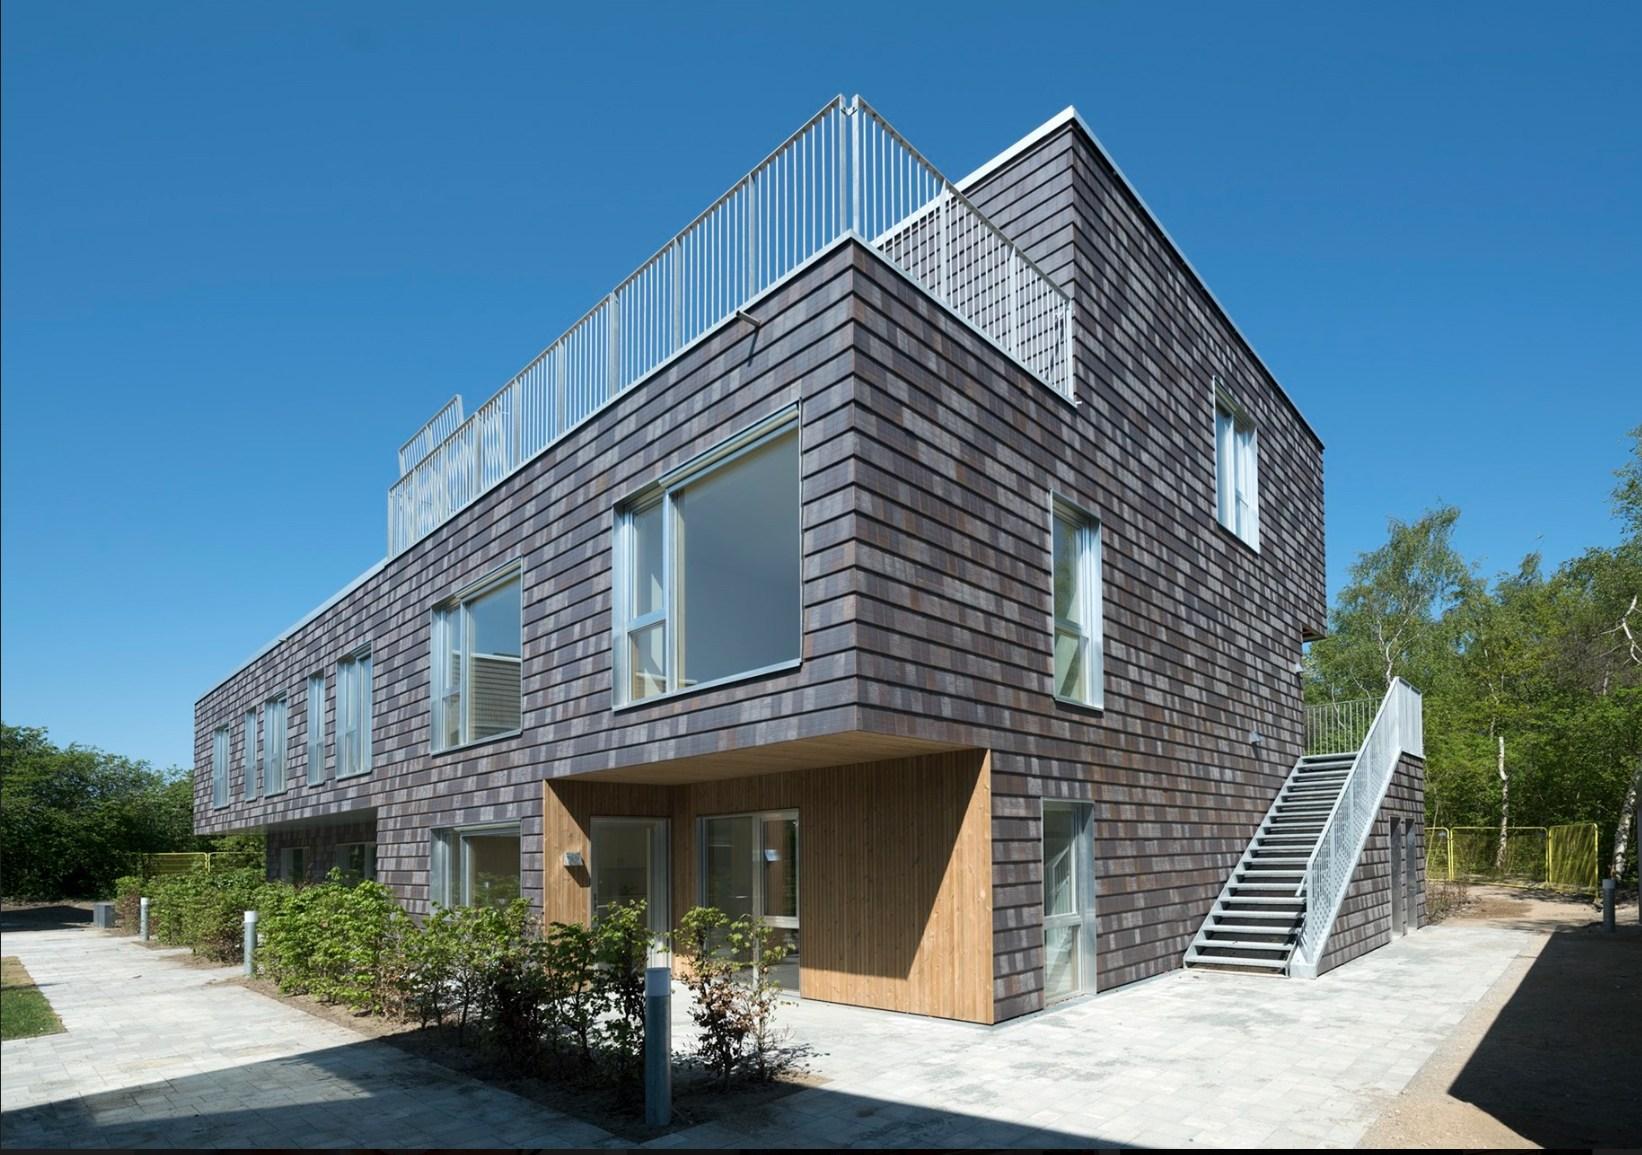 Robinievej-Albertslund-Bo-Vest-ONV-arkitekter-præfab-boliger-præfabrikeret-prefabricated-architect-8